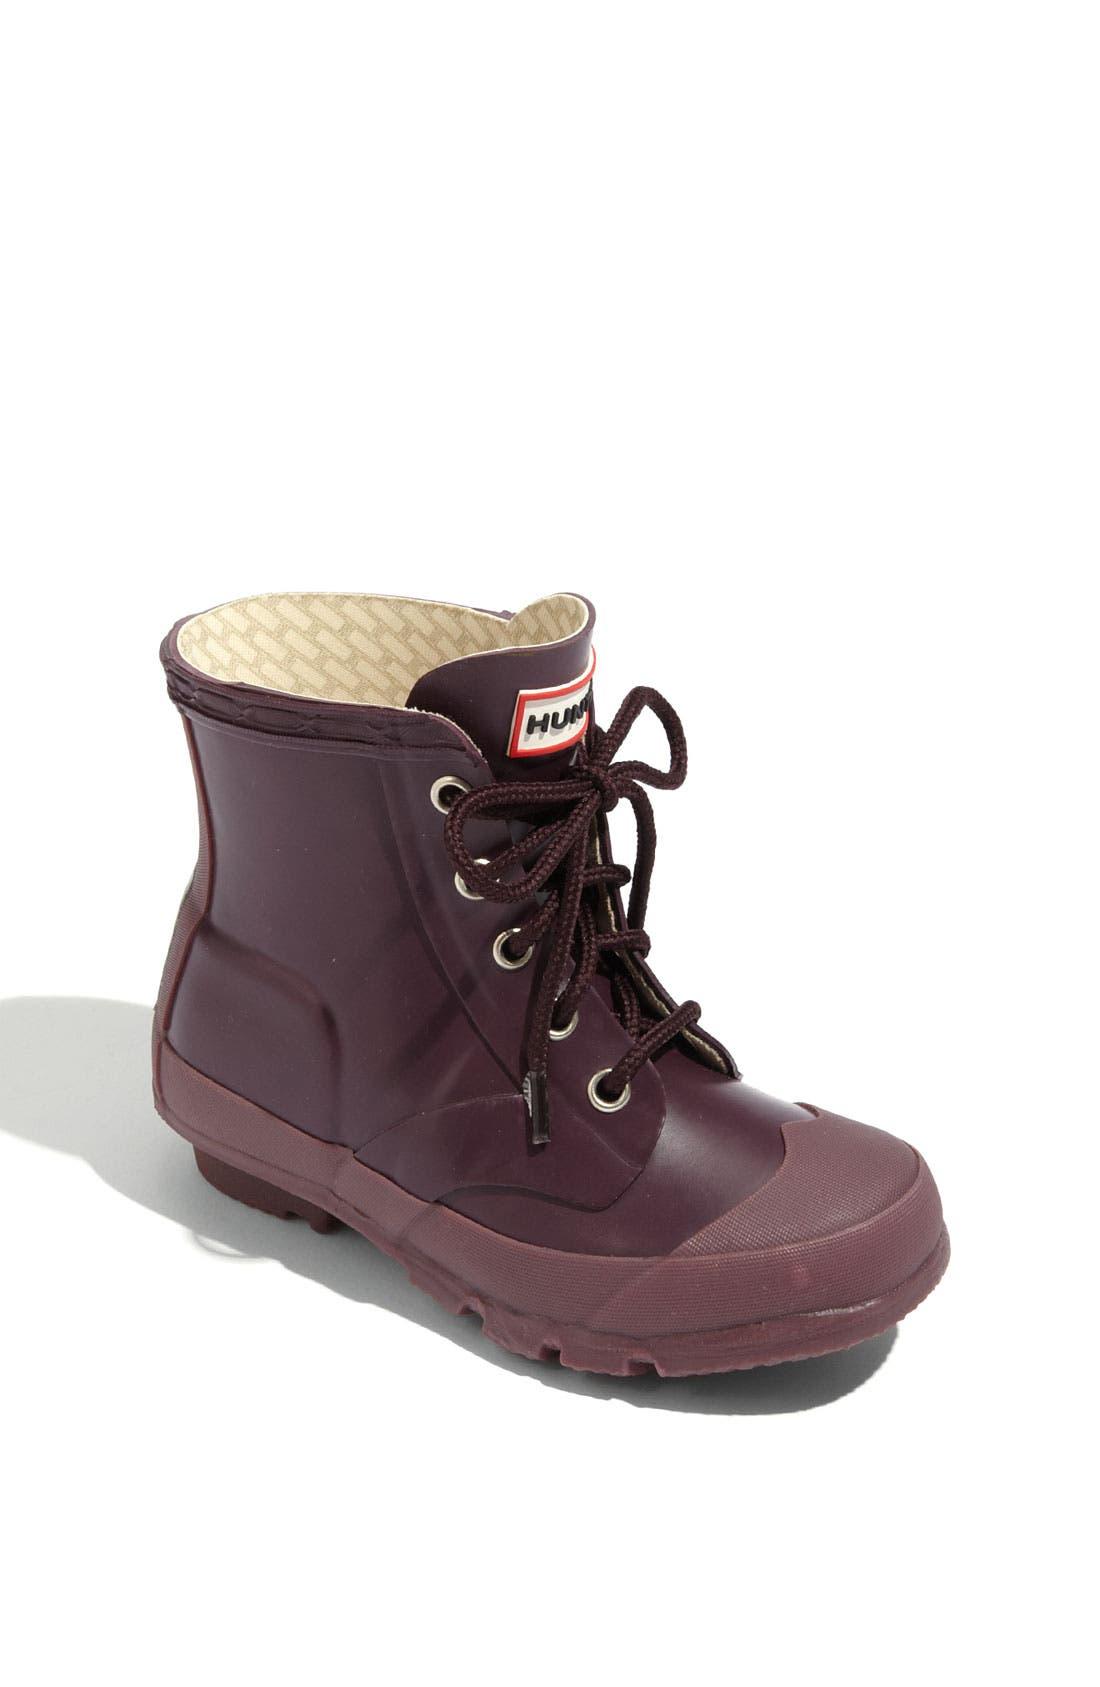 Main Image - Hunter 'Petite Brixen' Boot (Toddler & Little Kid)